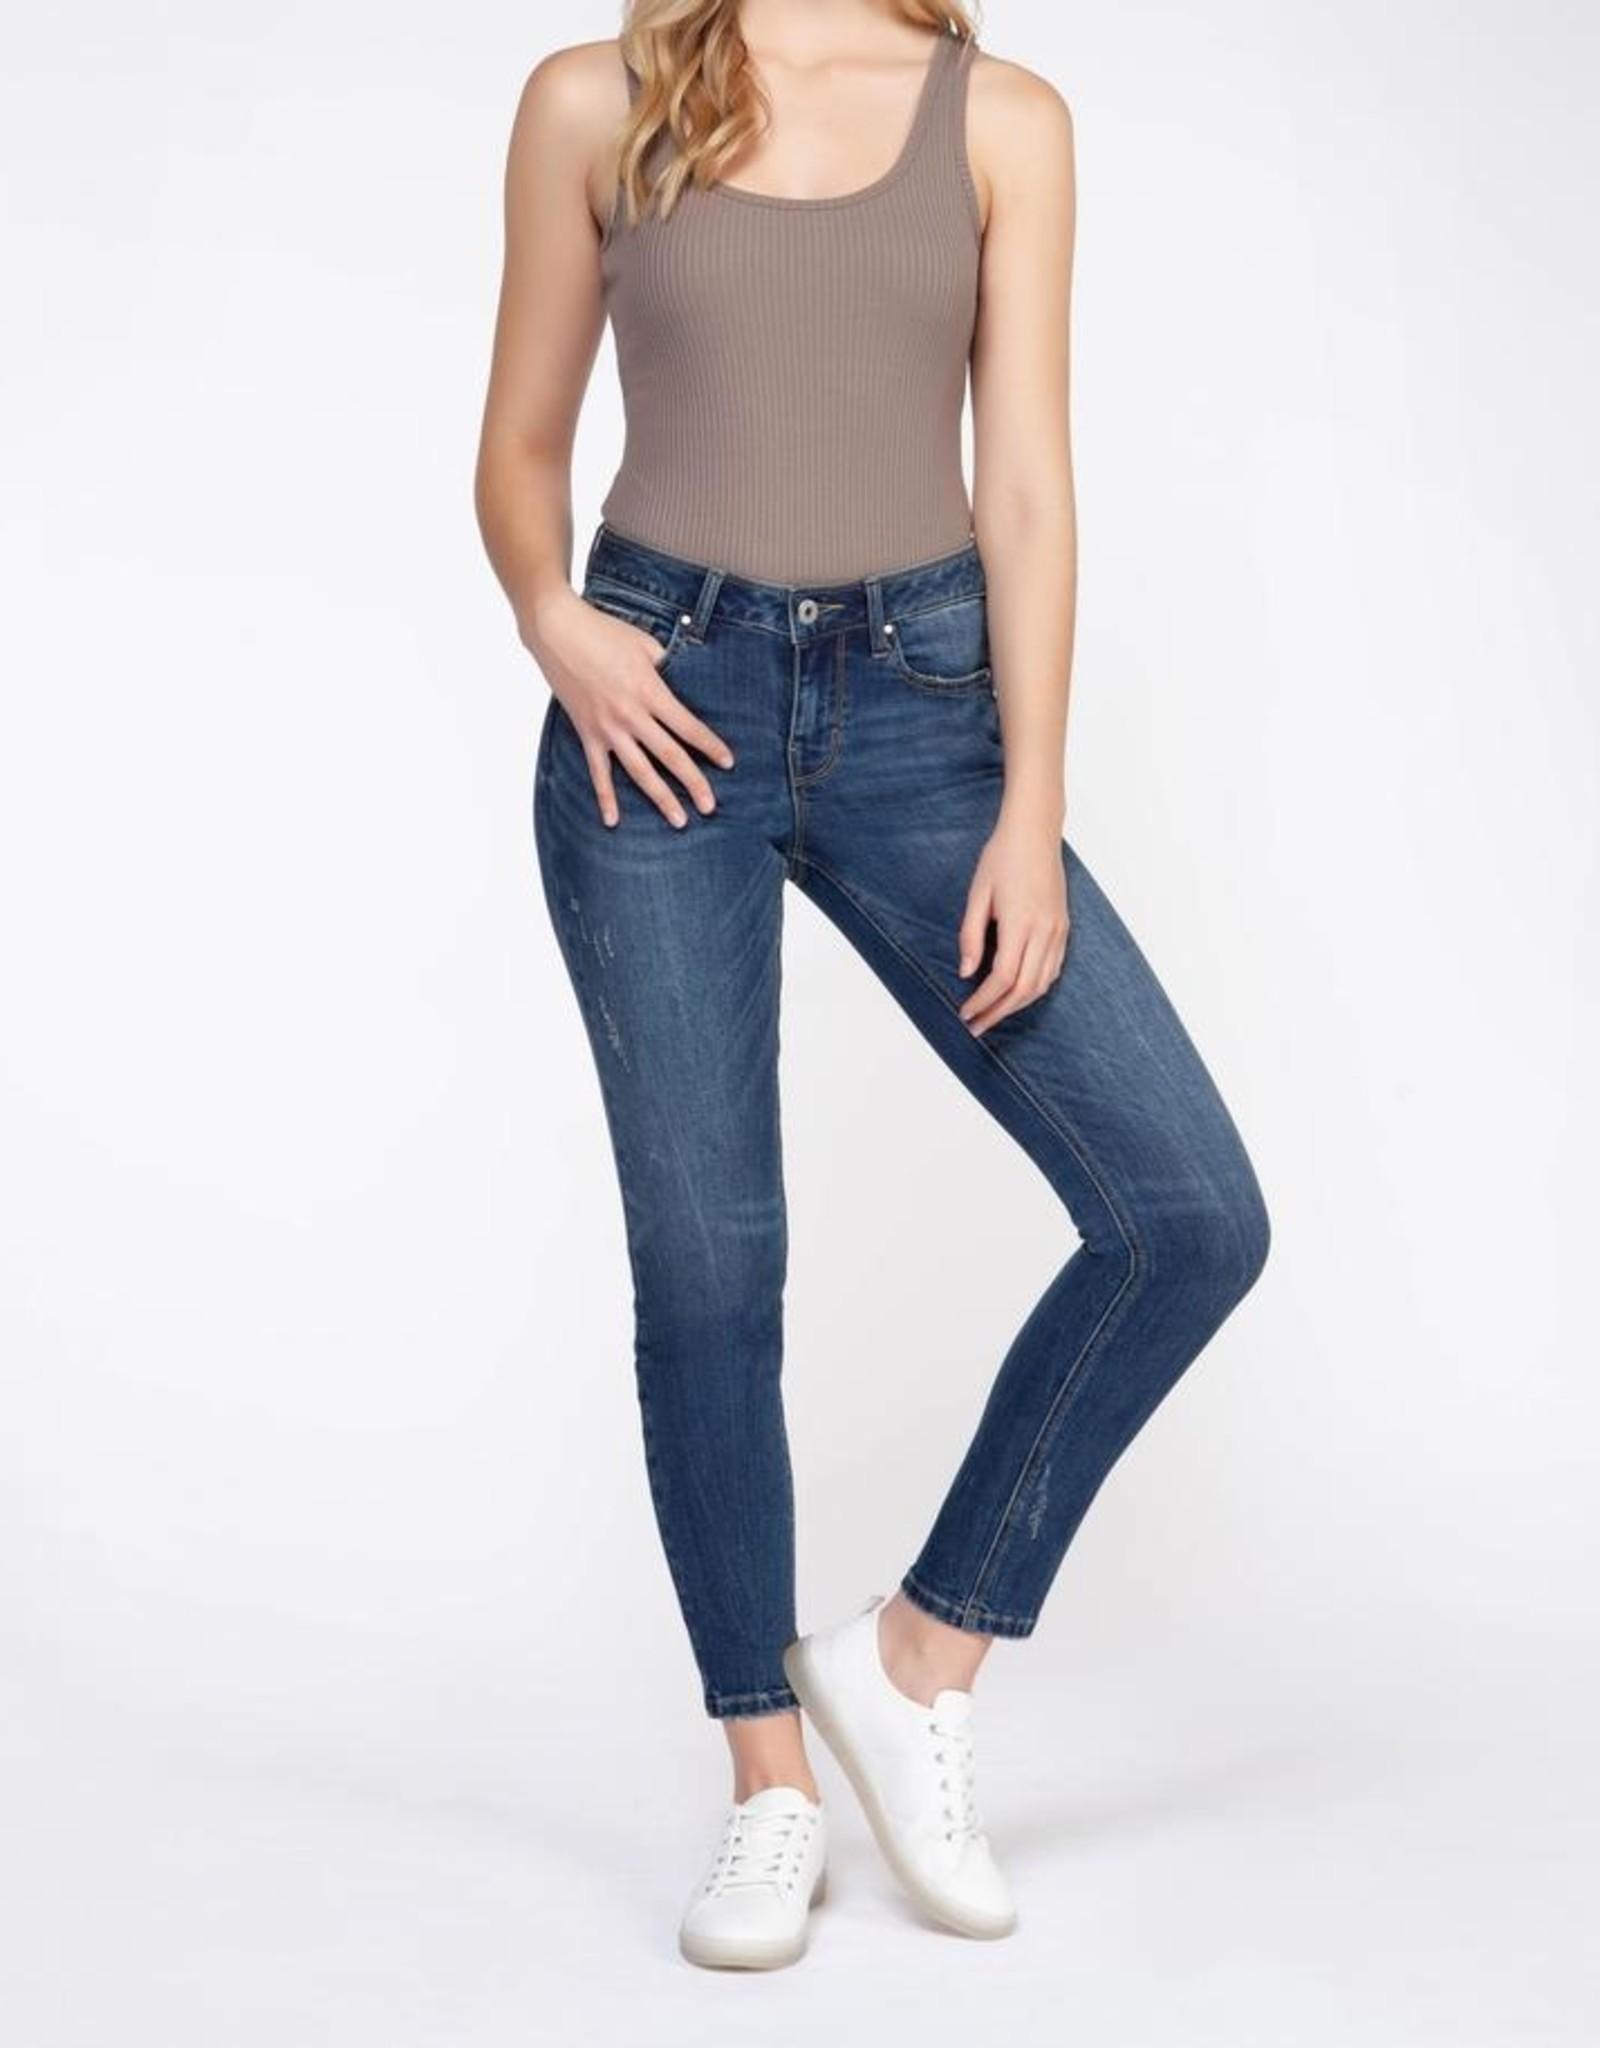 Dex Bros Clothing Co Ltd. Ribbed bodysuit, taupe